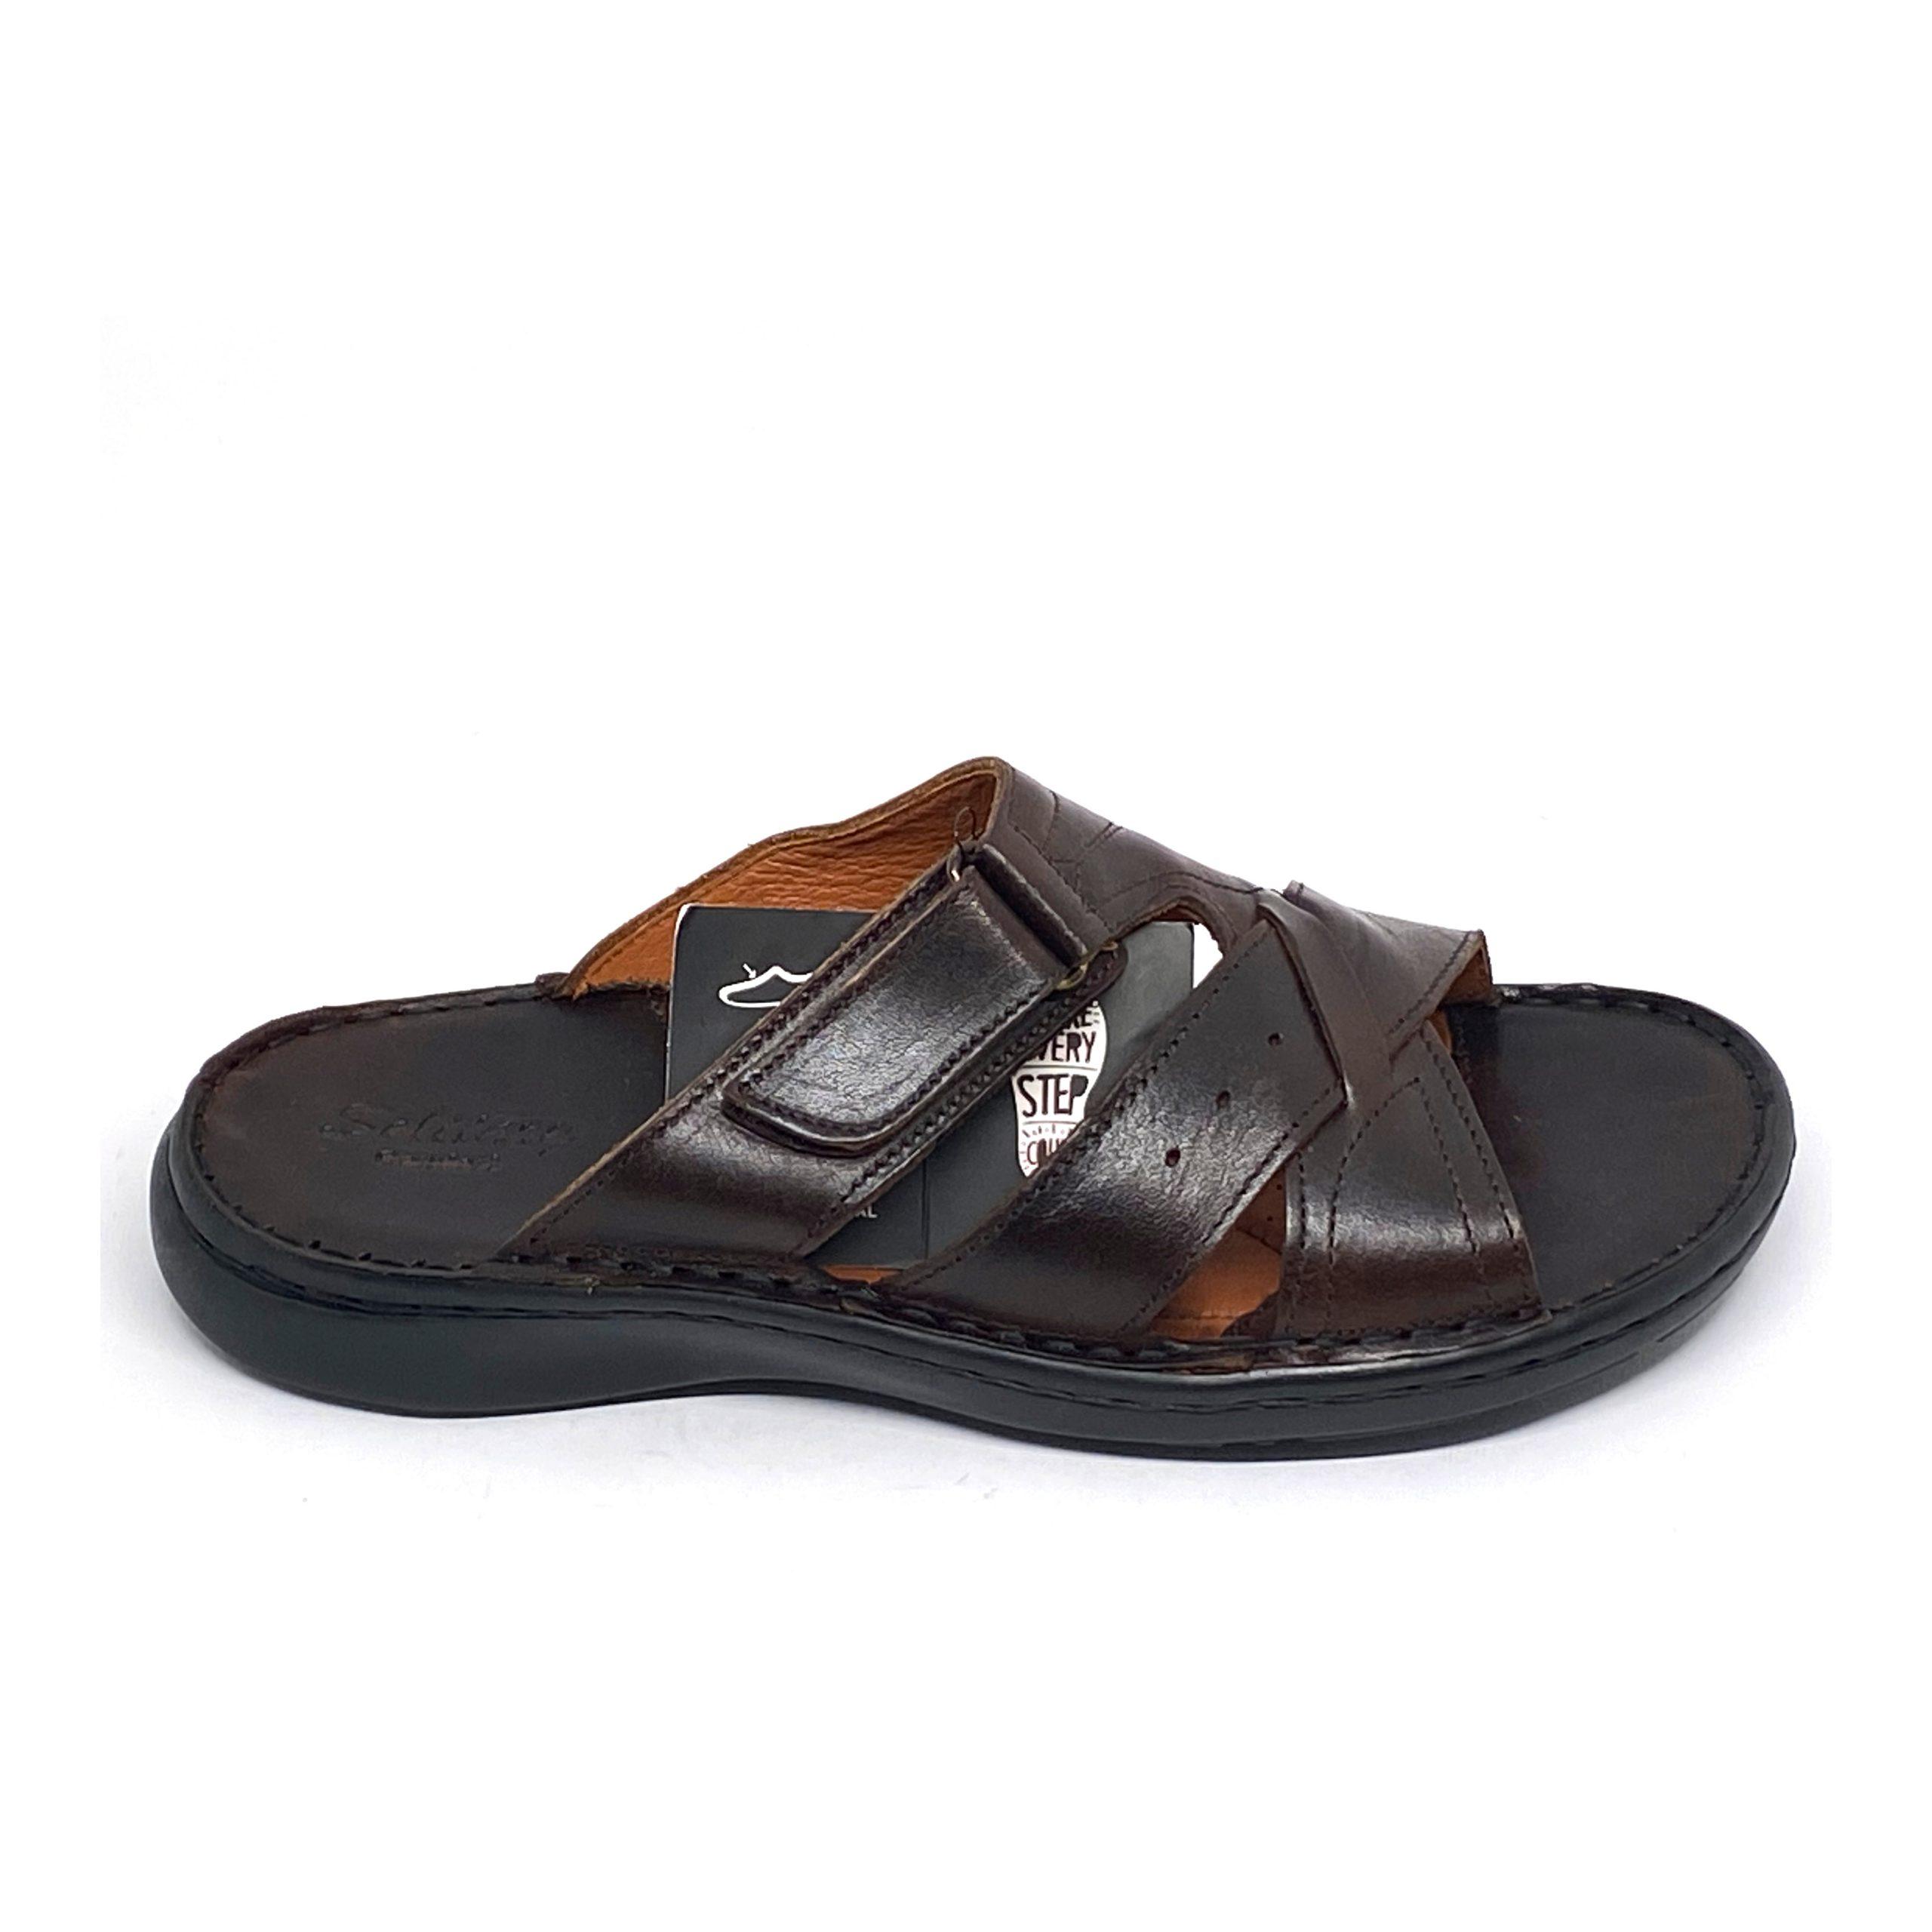 Sandalia piel Solitary